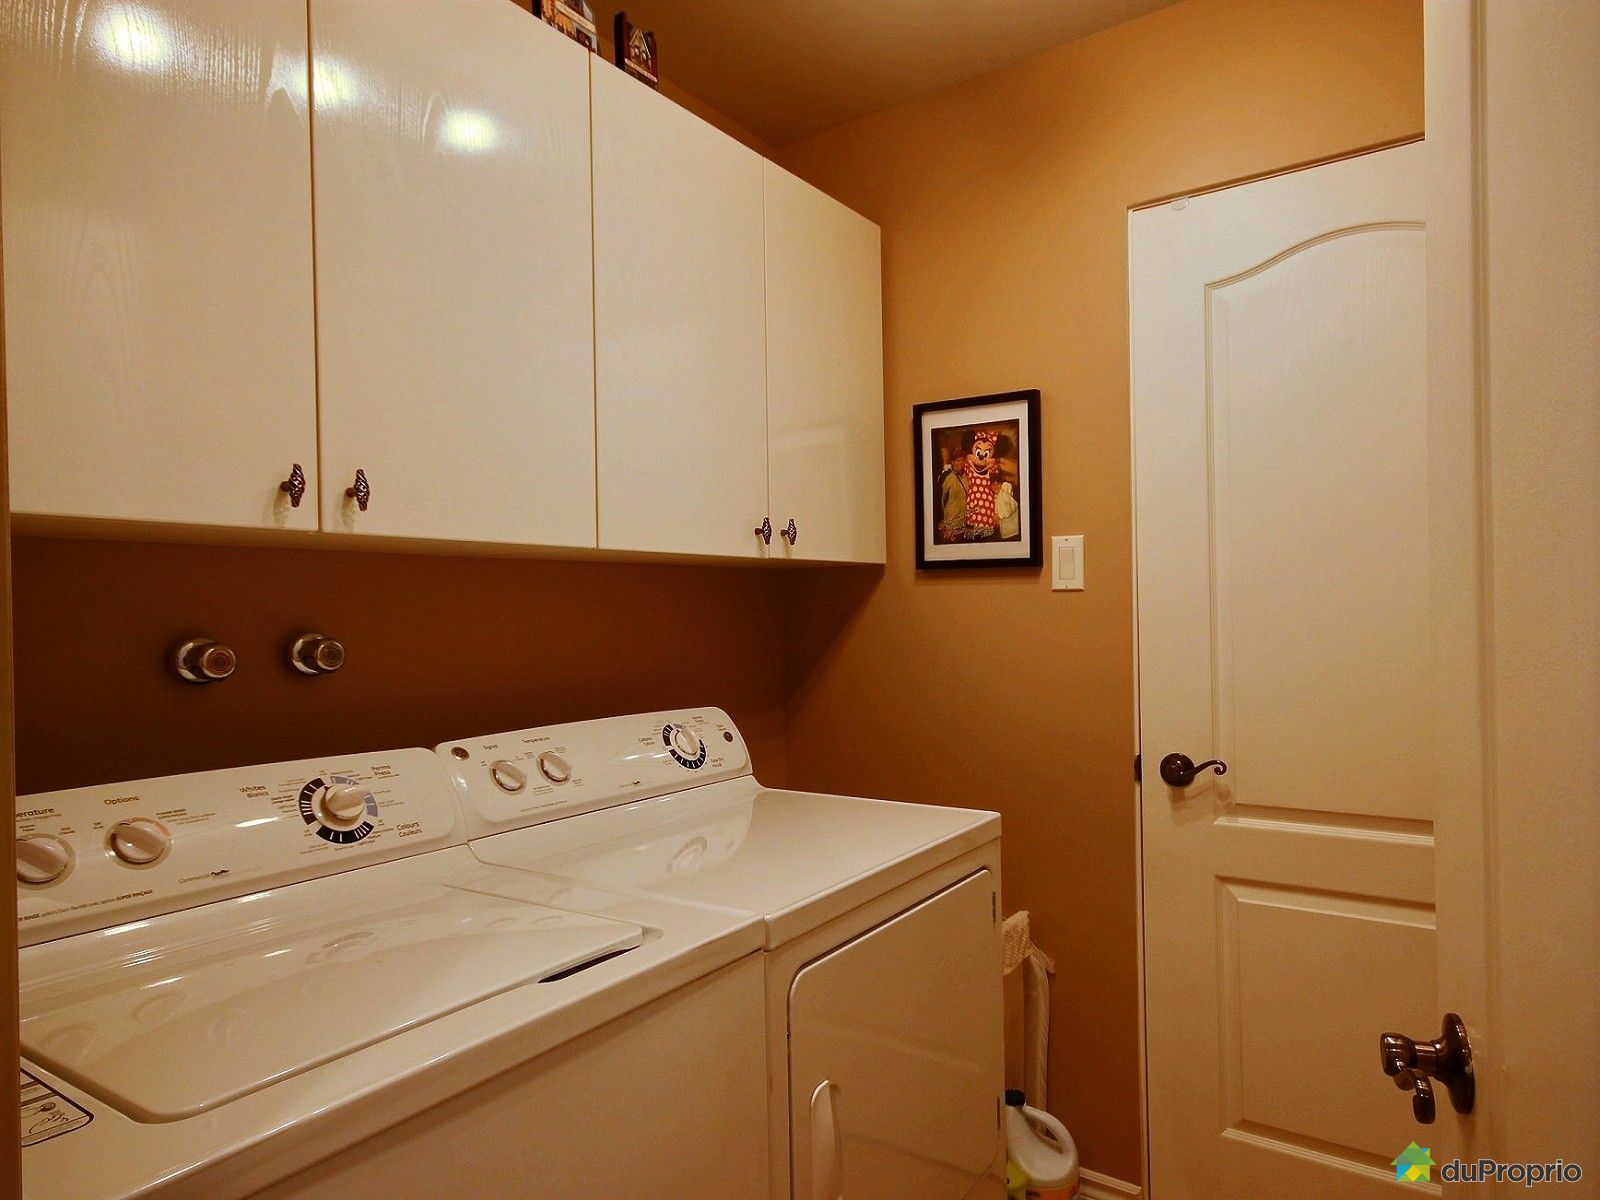 jumel vendu chicoutimi immobilier qu bec duproprio 623241. Black Bedroom Furniture Sets. Home Design Ideas